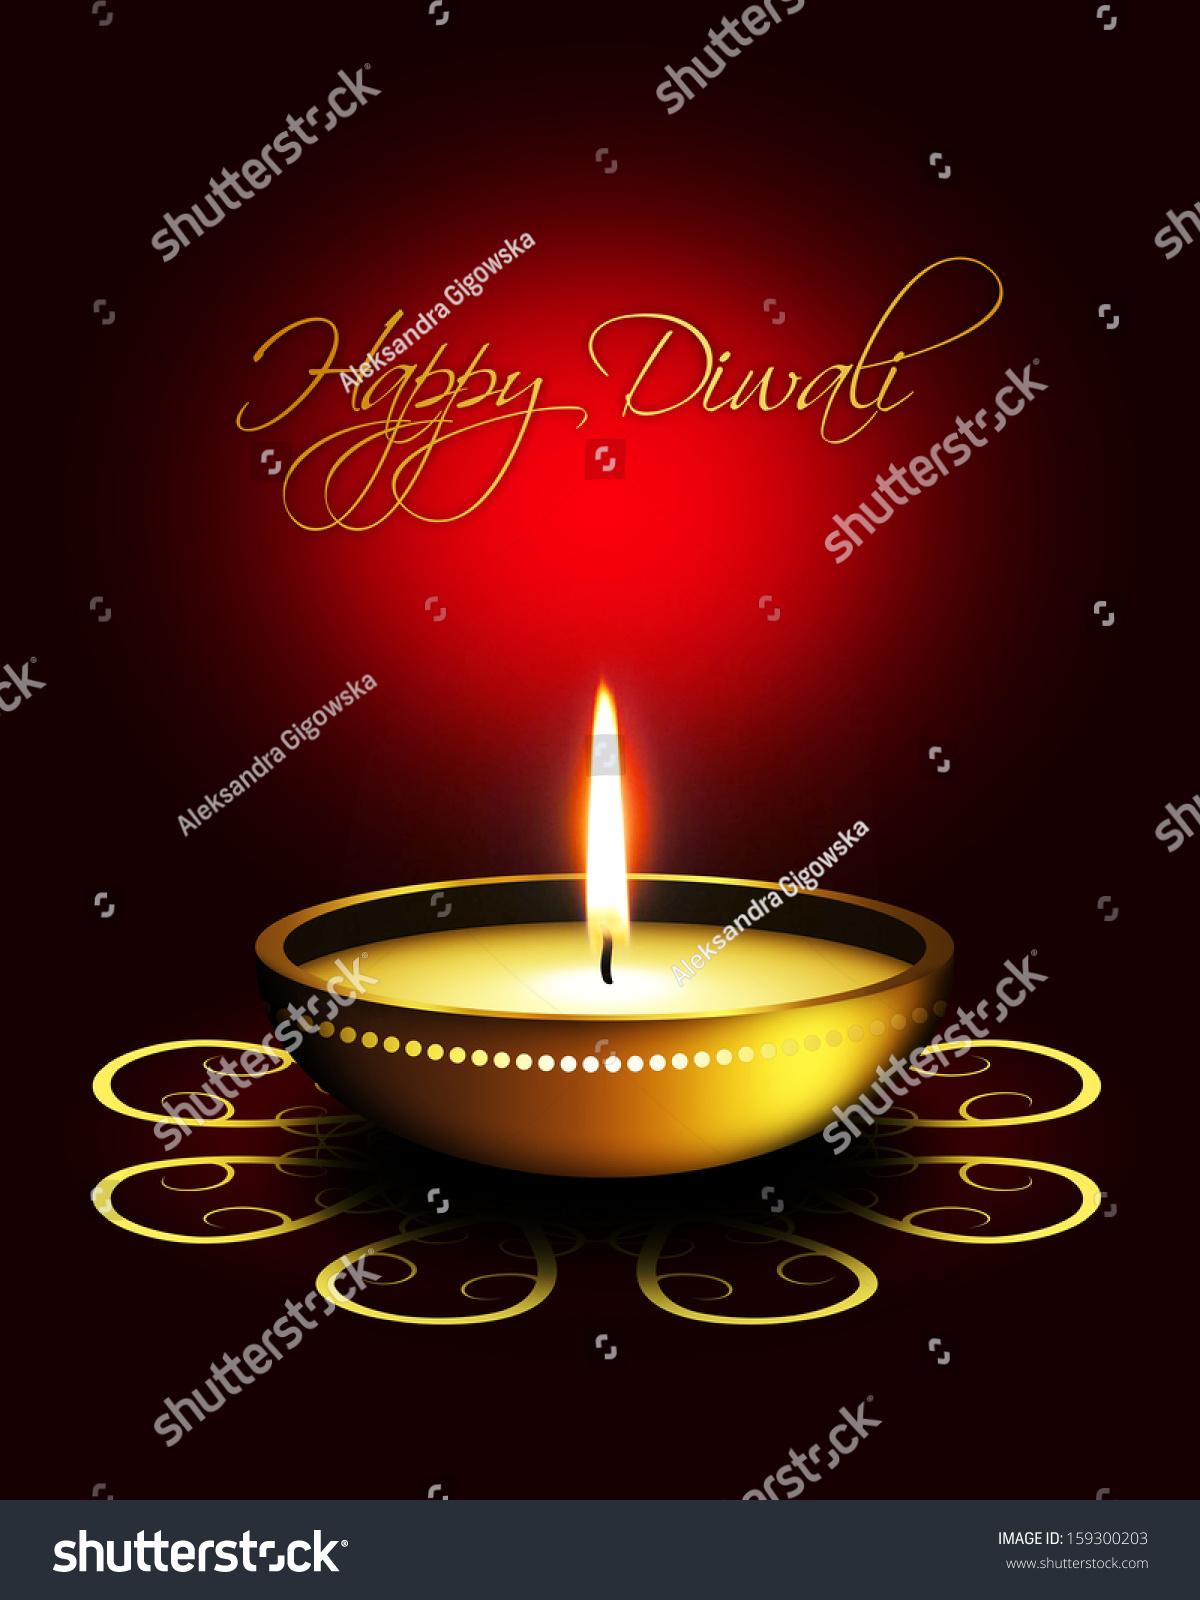 Oil Lamp Diwali Greetings Over Dark Stock Illustration 159300203